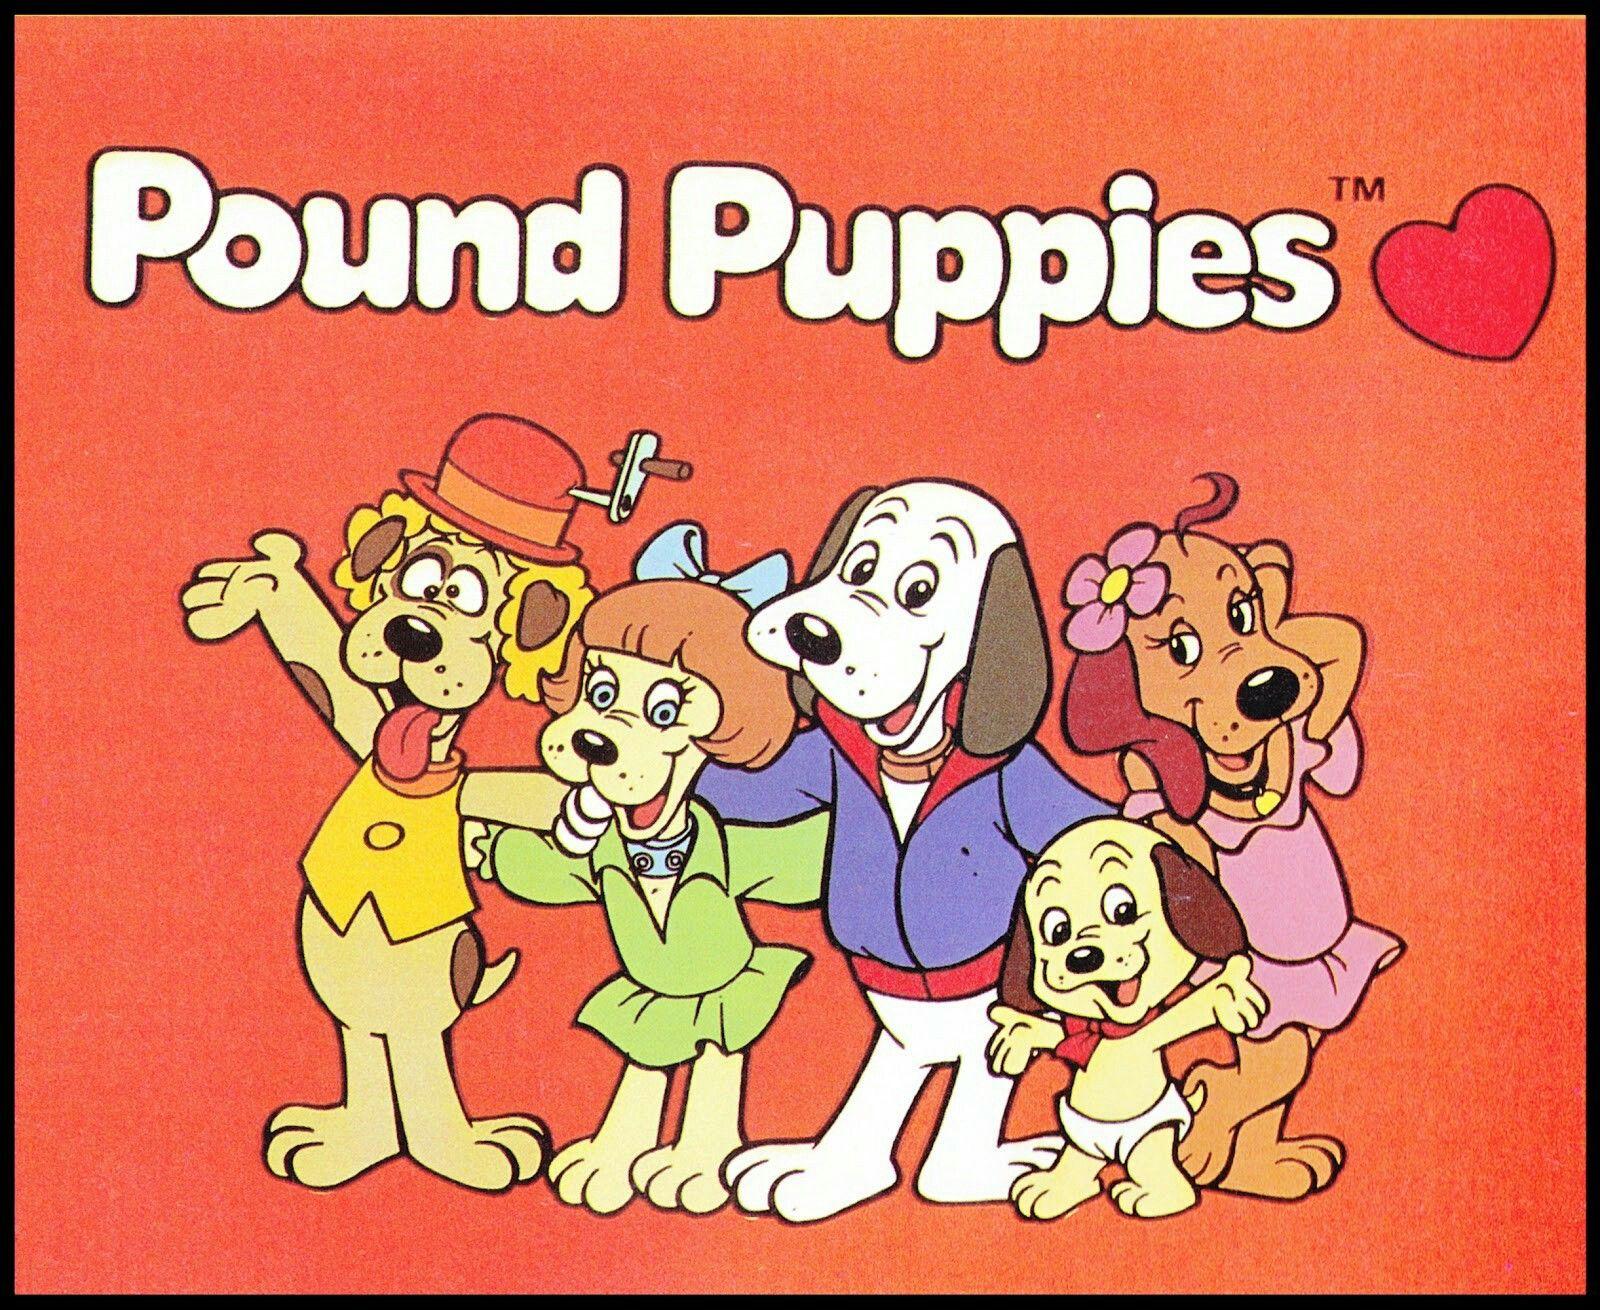 Pound Puppies Pound Puppies Pound Puppies Cartoon 80s Cartoons